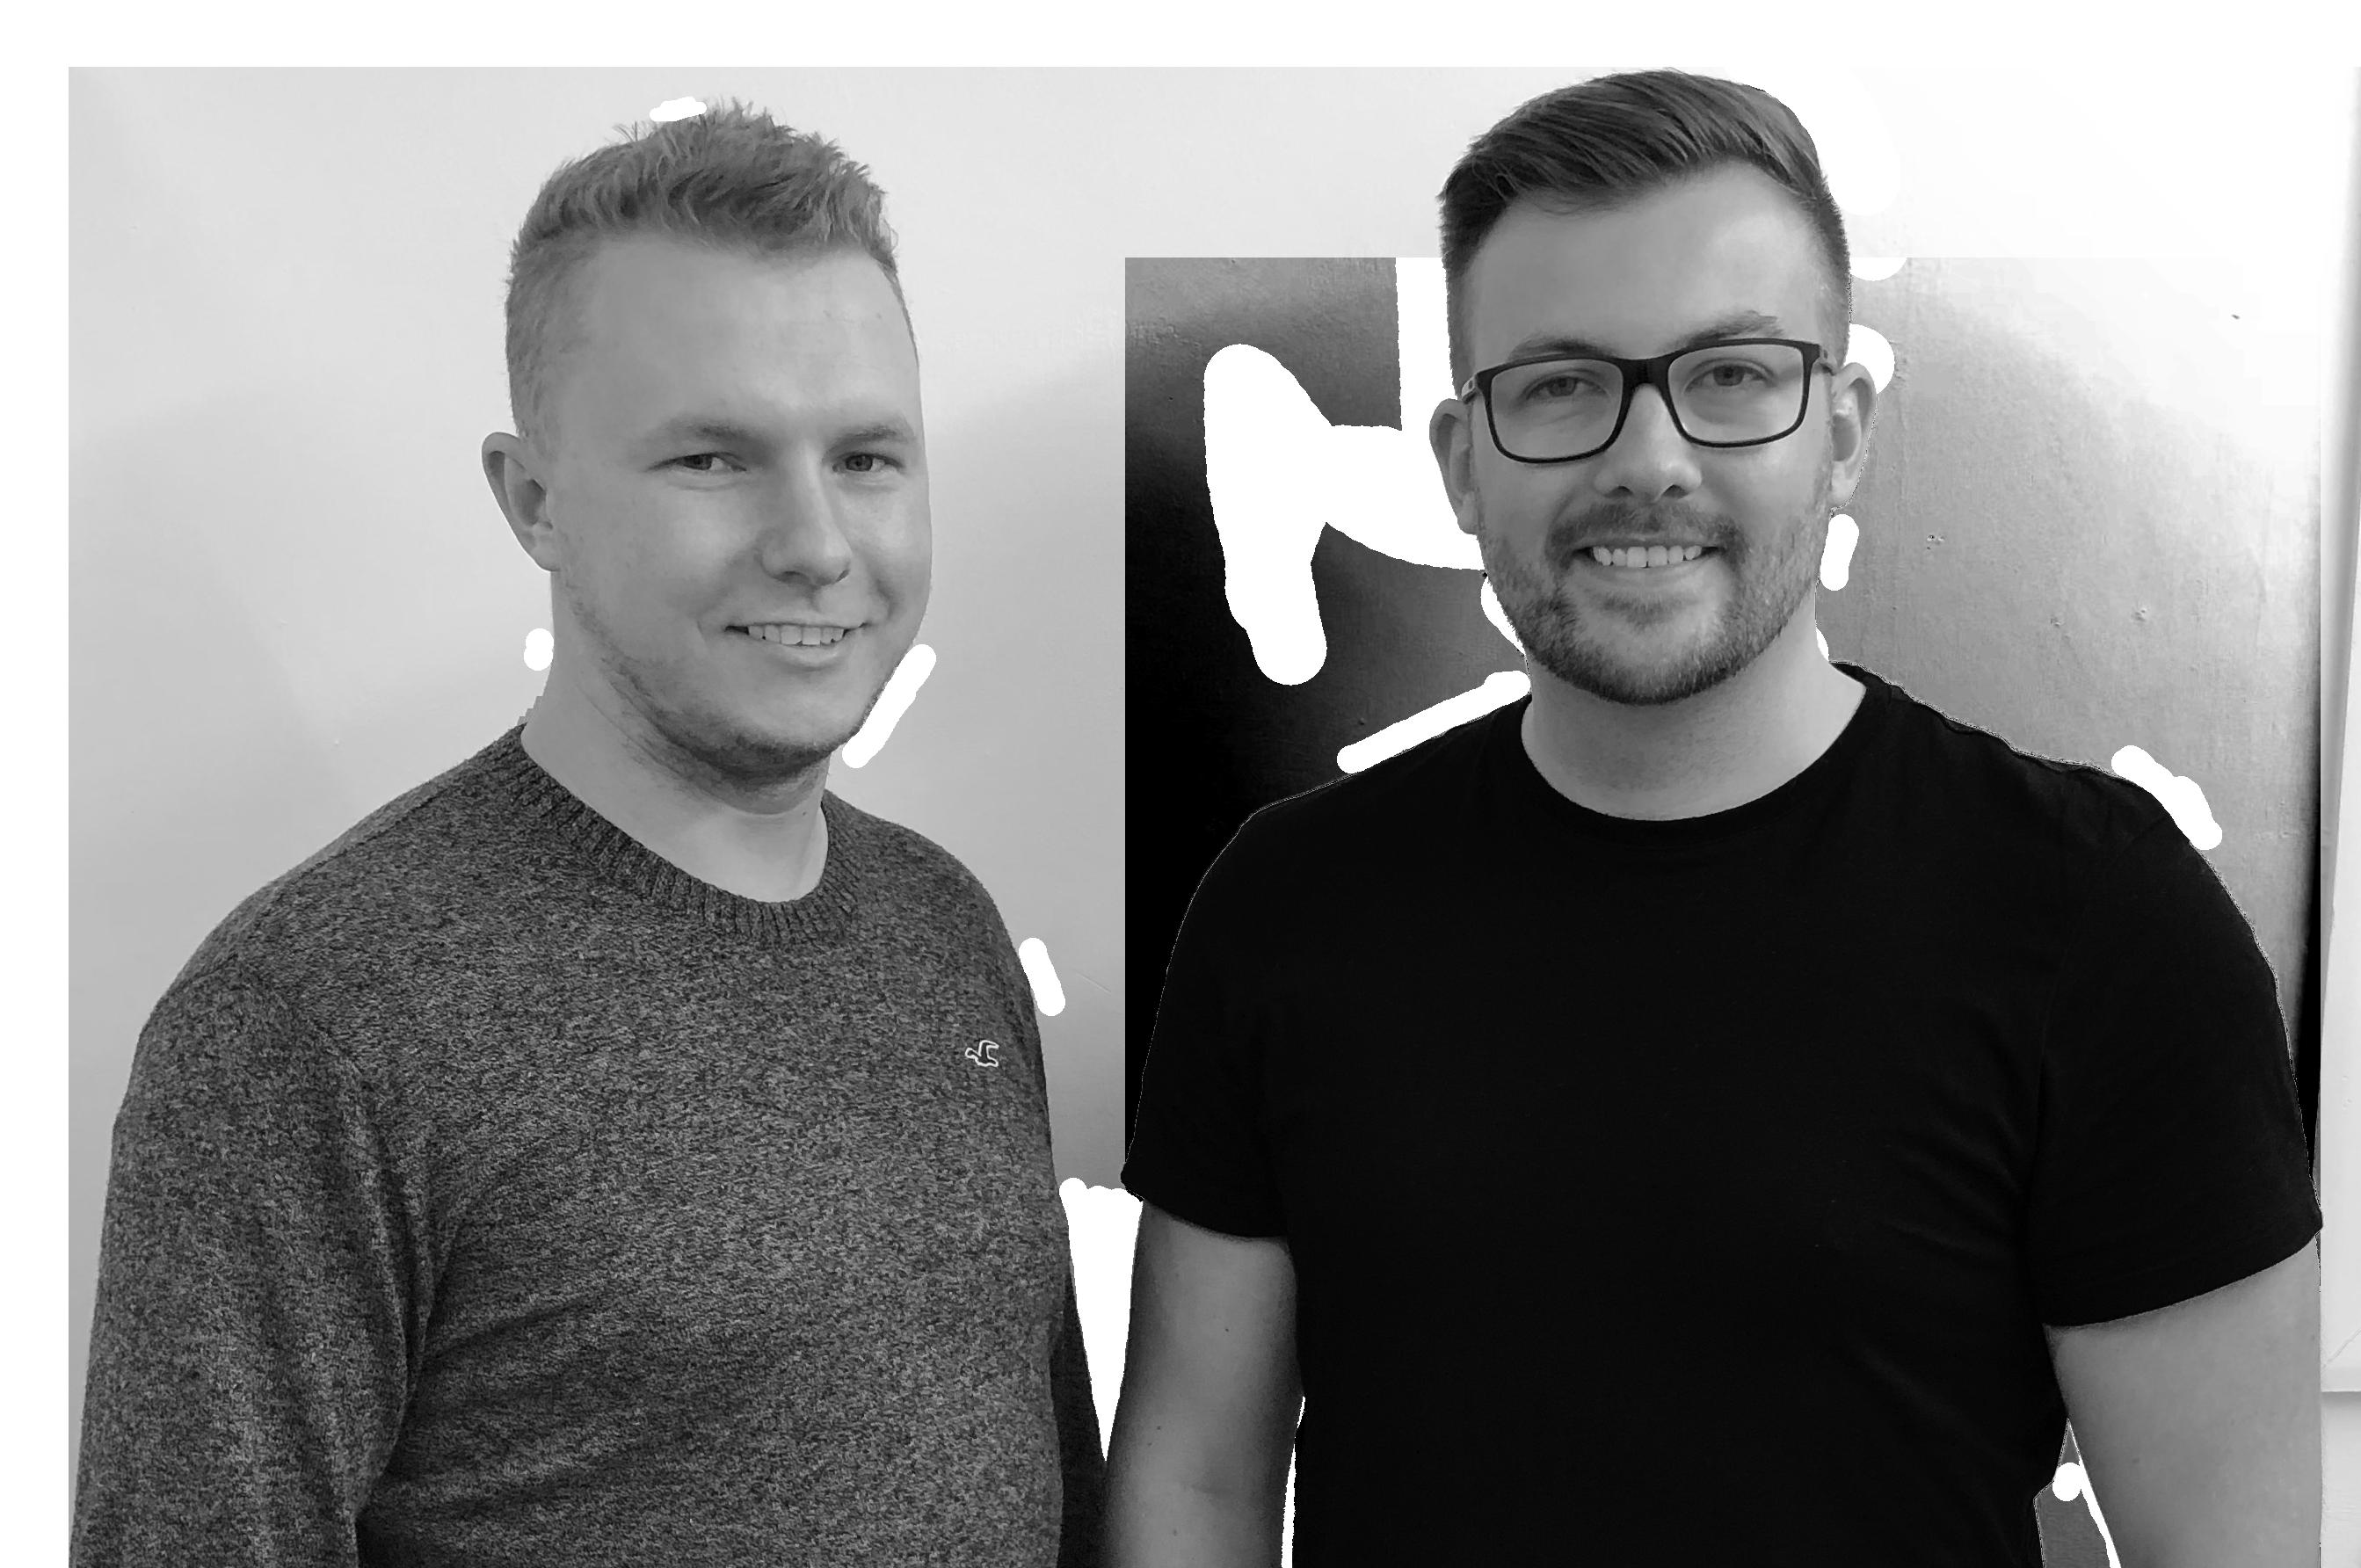 A portrait of Two web design/ developers